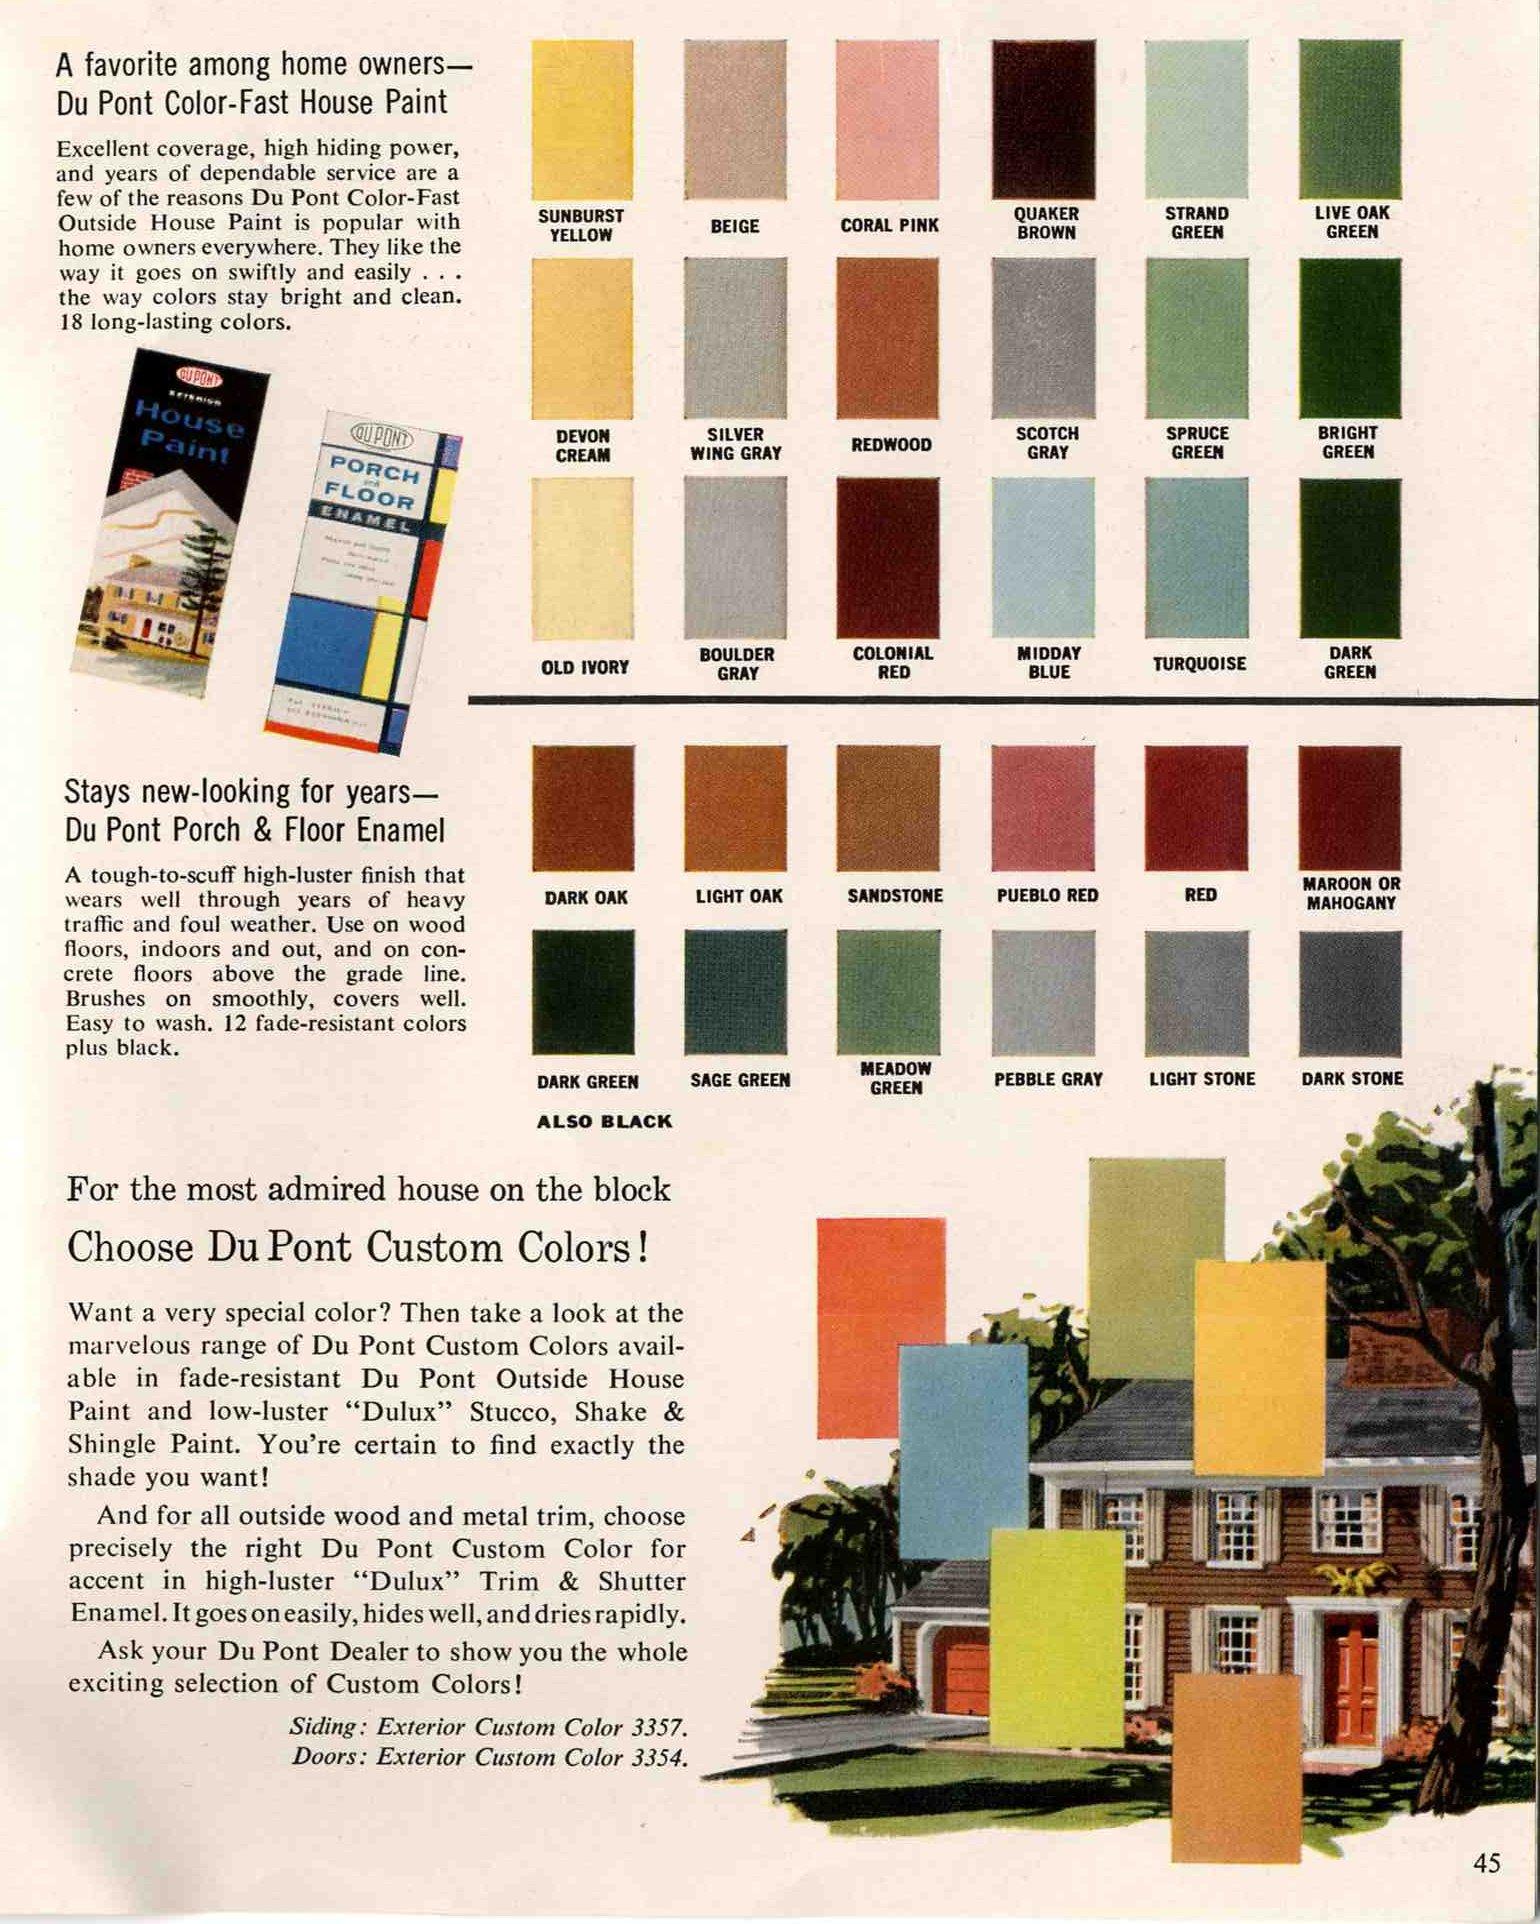 Marvelous Exterior Colors For 1960 Houses Retro Renovation Largest Home Design Picture Inspirations Pitcheantrous